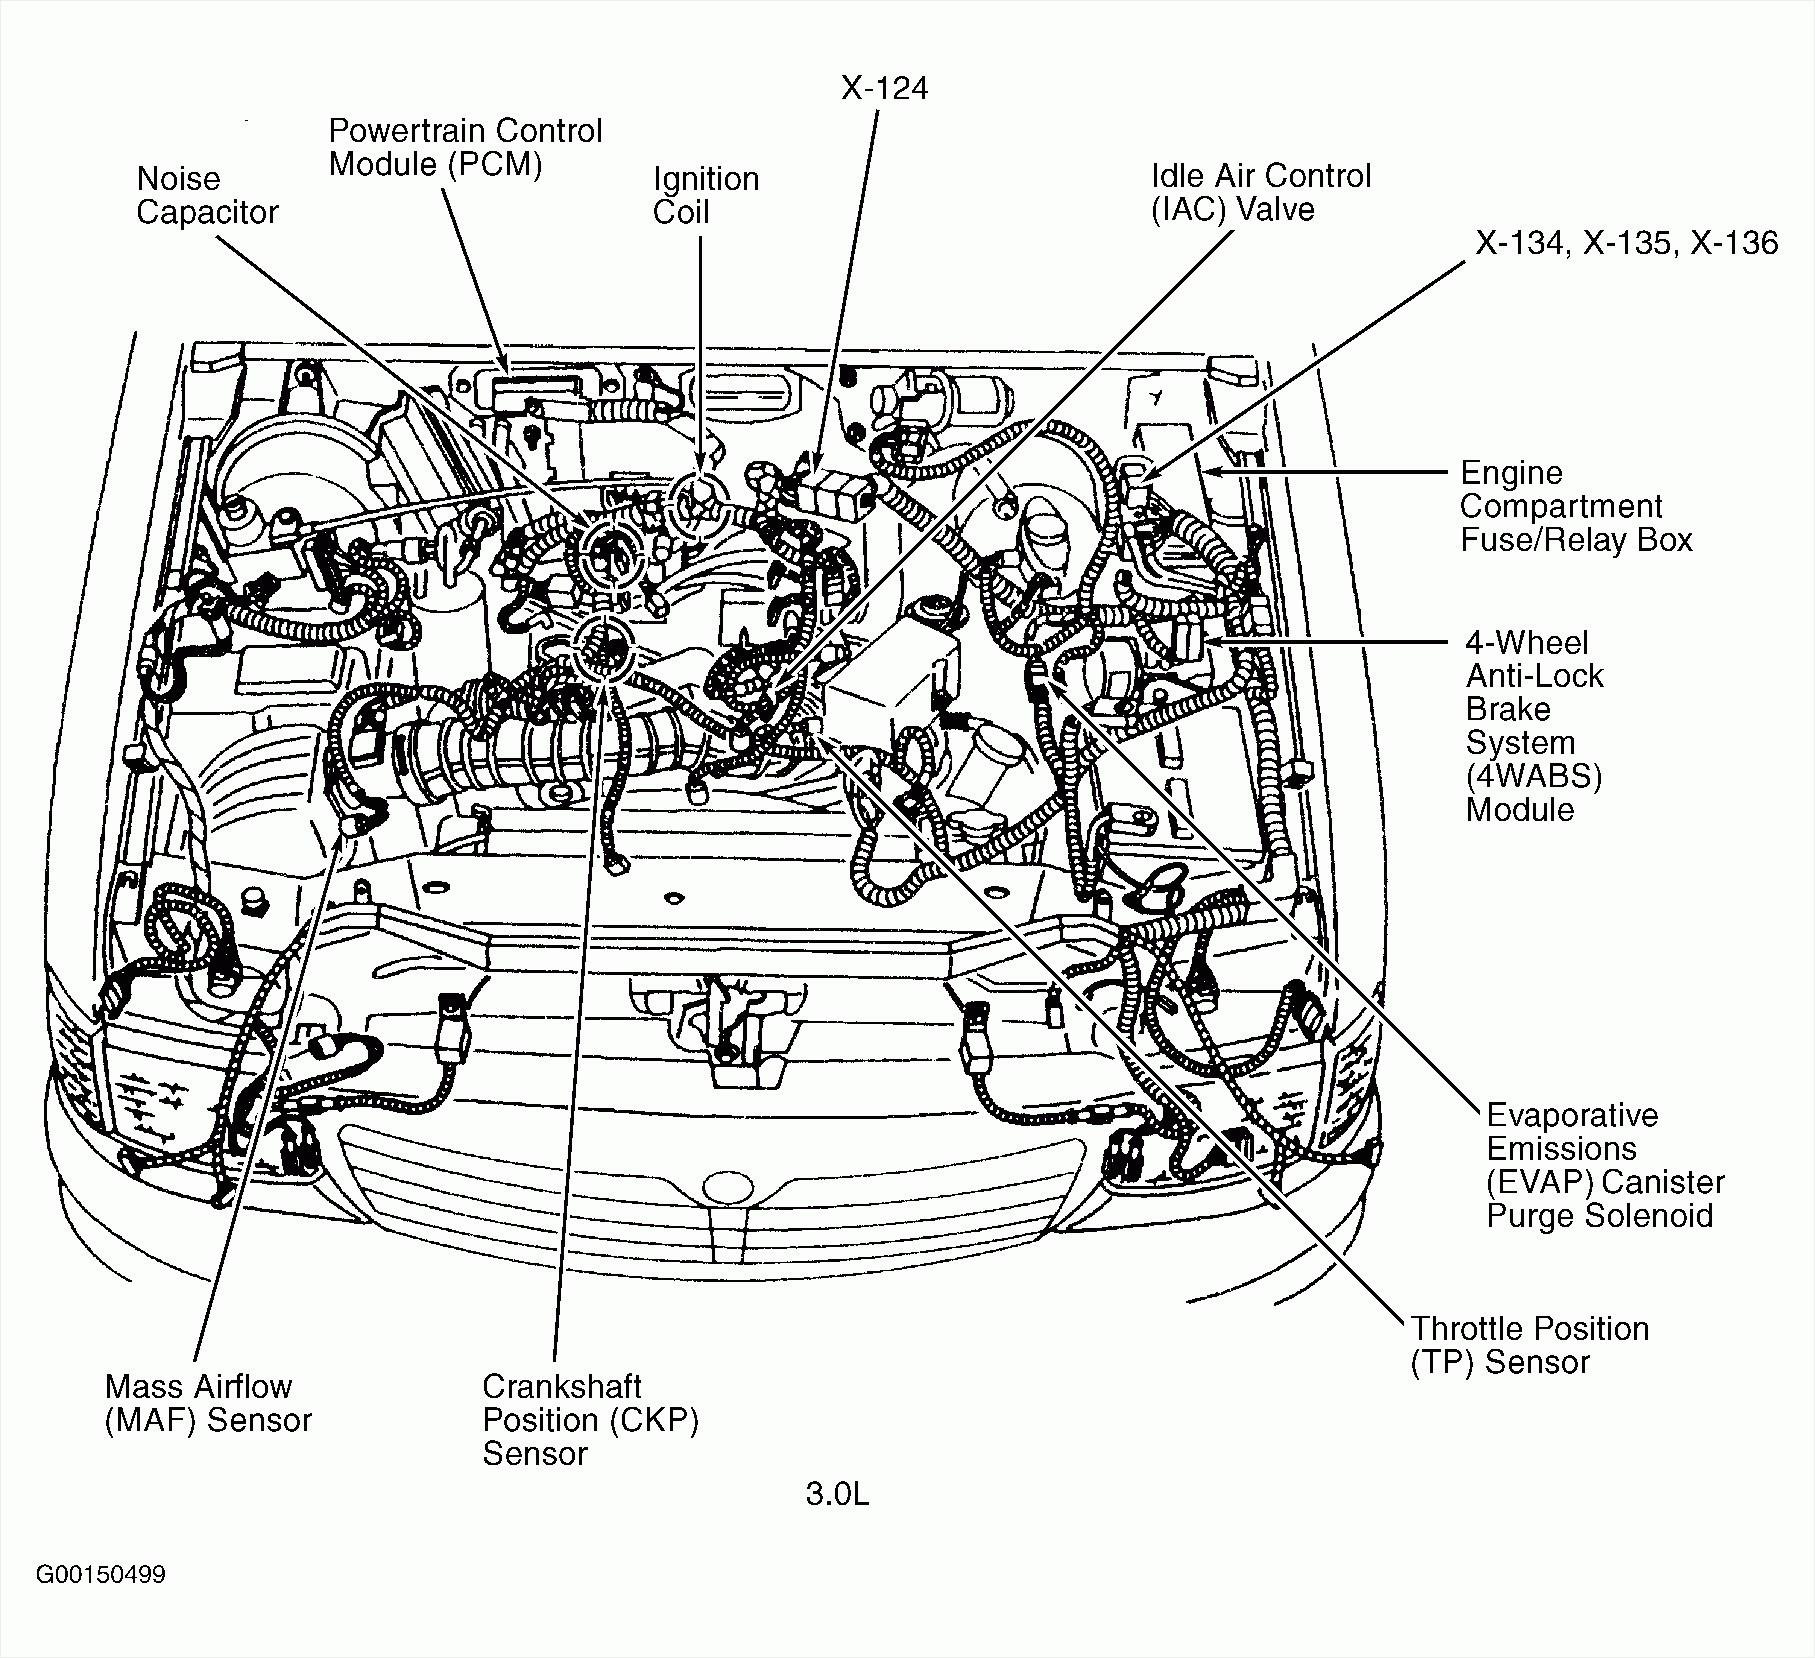 1998 ford Windstar Engine Diagram ford Windstar 3 8 Engine Diagram Wiring Diagrams Konsult Of 1998 ford Windstar Engine Diagram